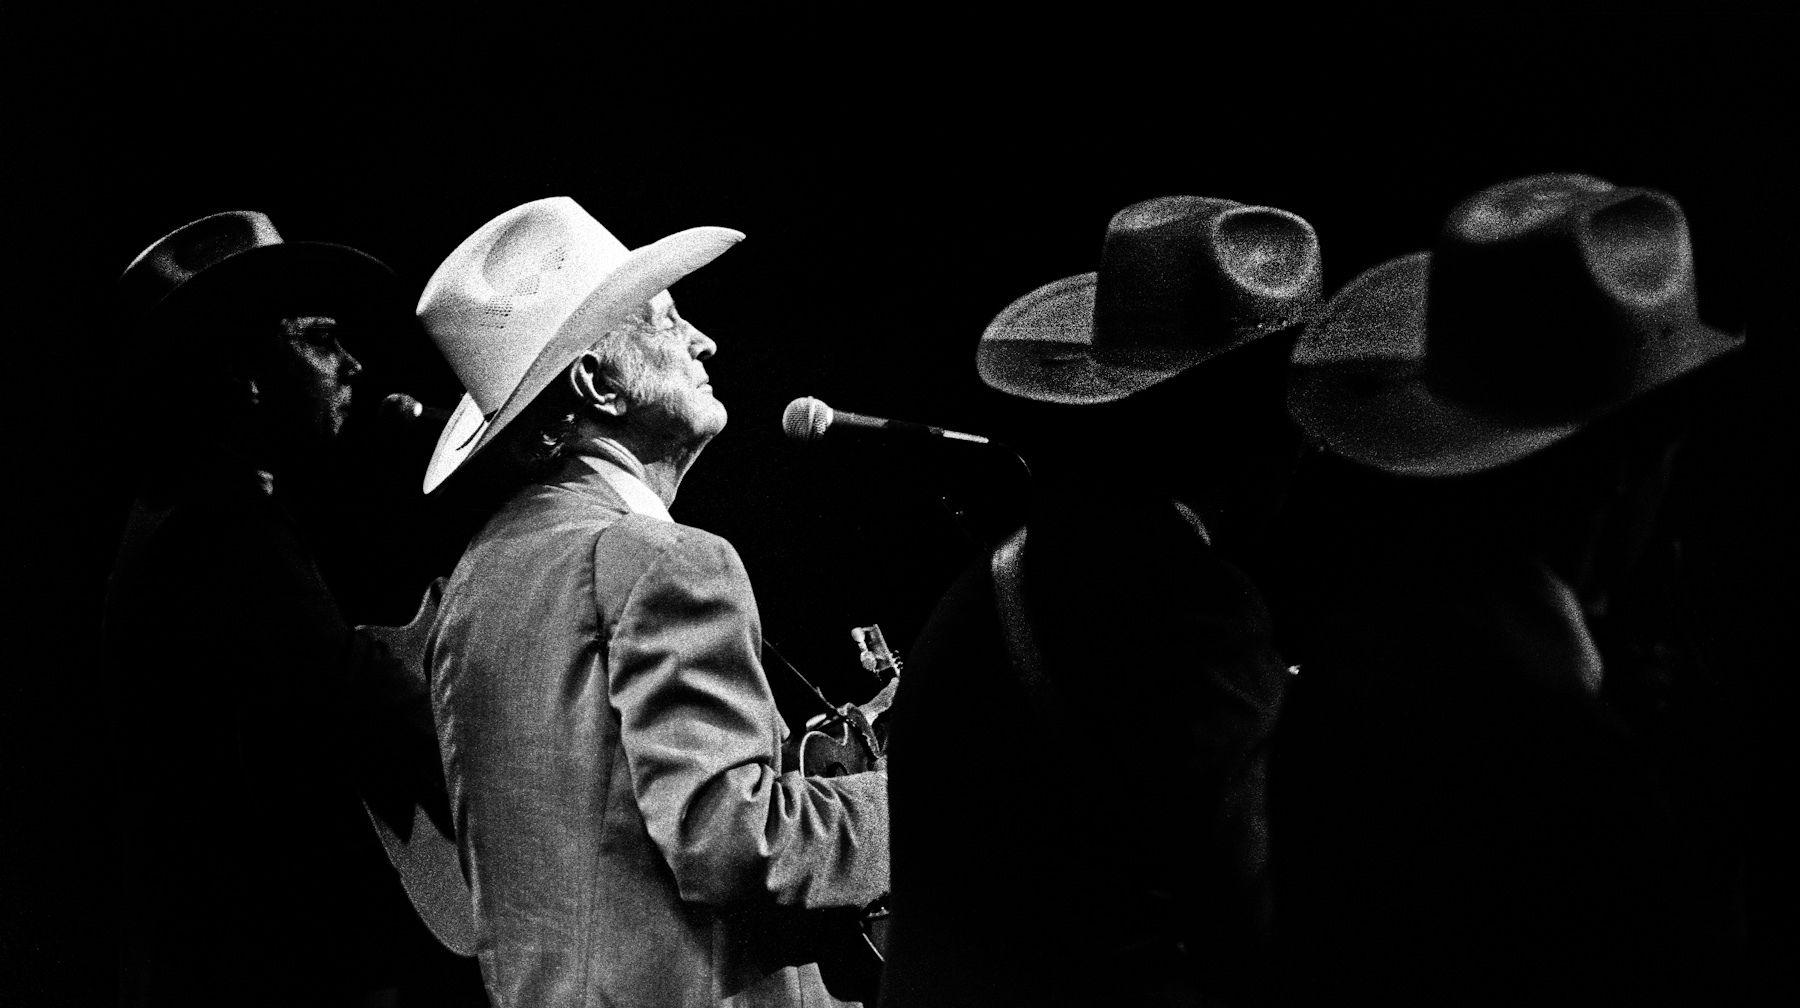 Bill Monroe 07/25/93